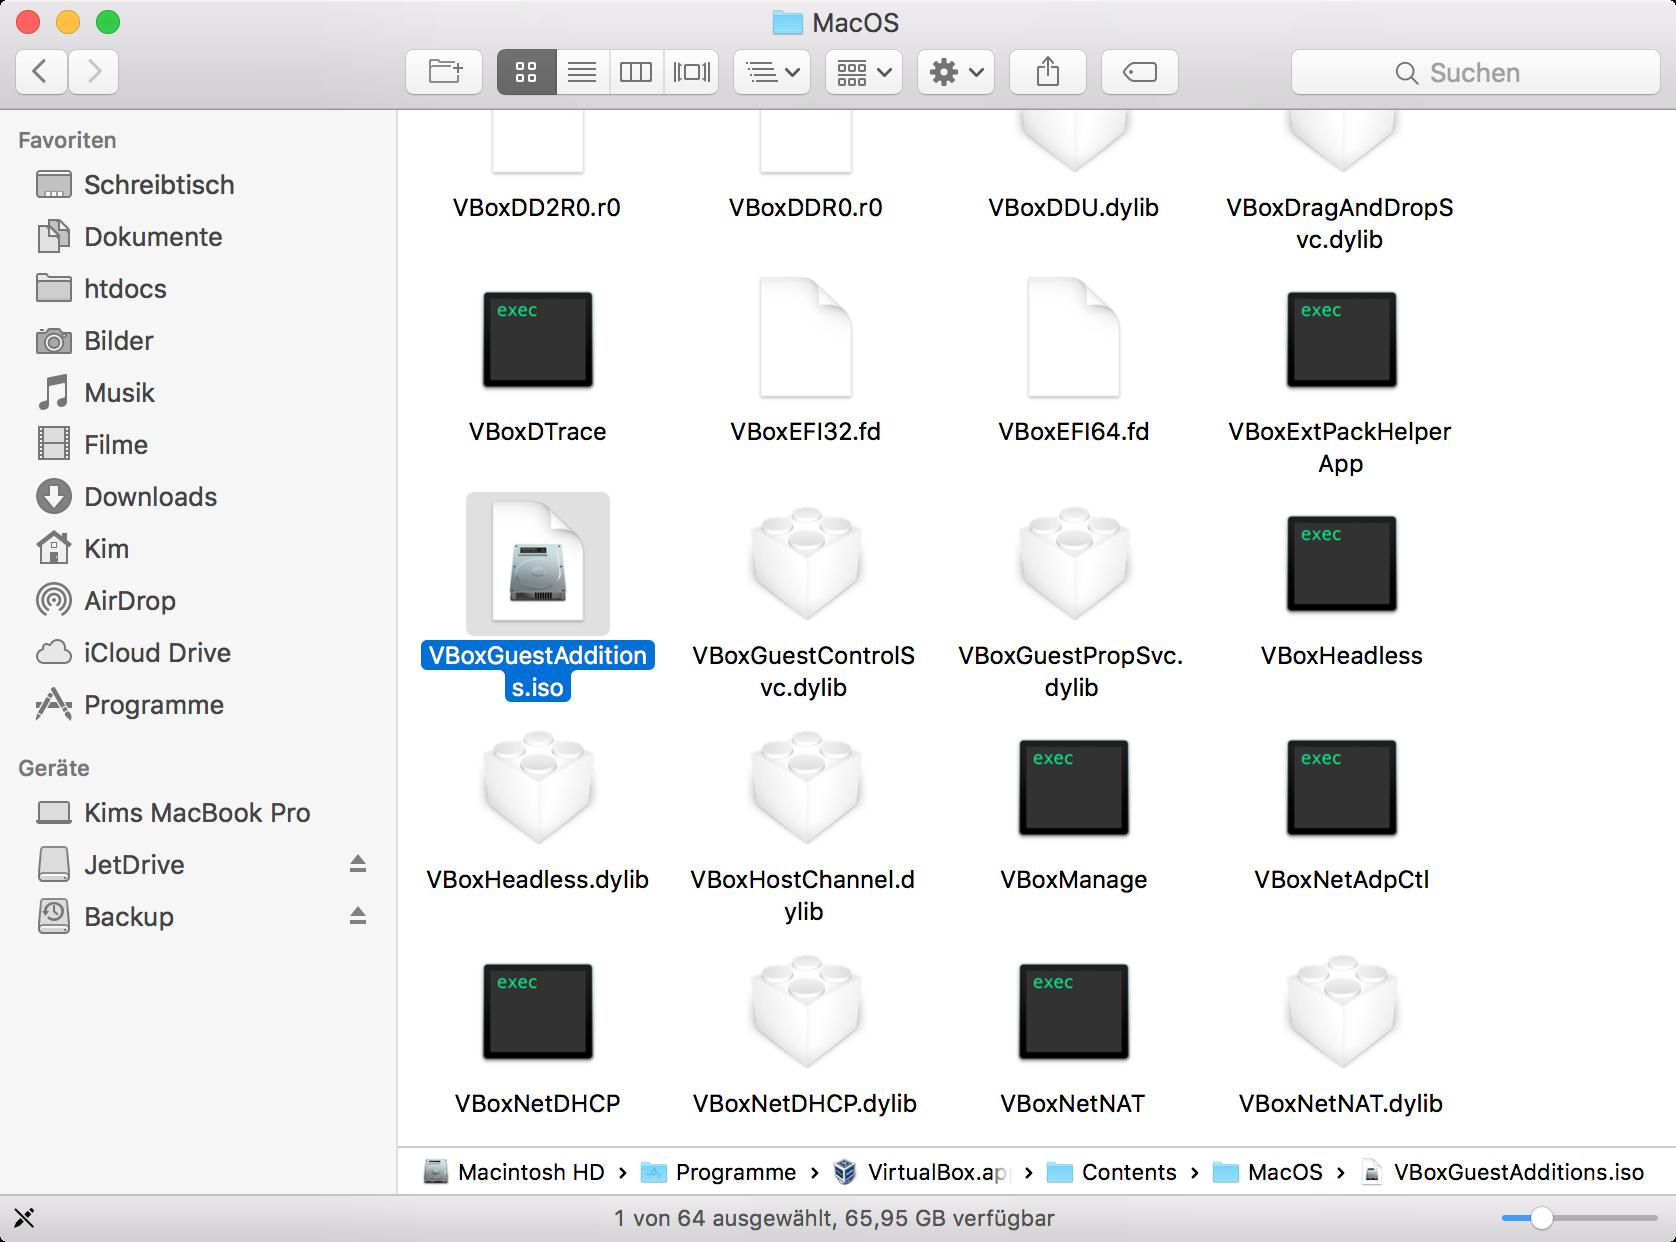 VBoxGuestAdditions.iso VirtualBox.app Paketinhalt